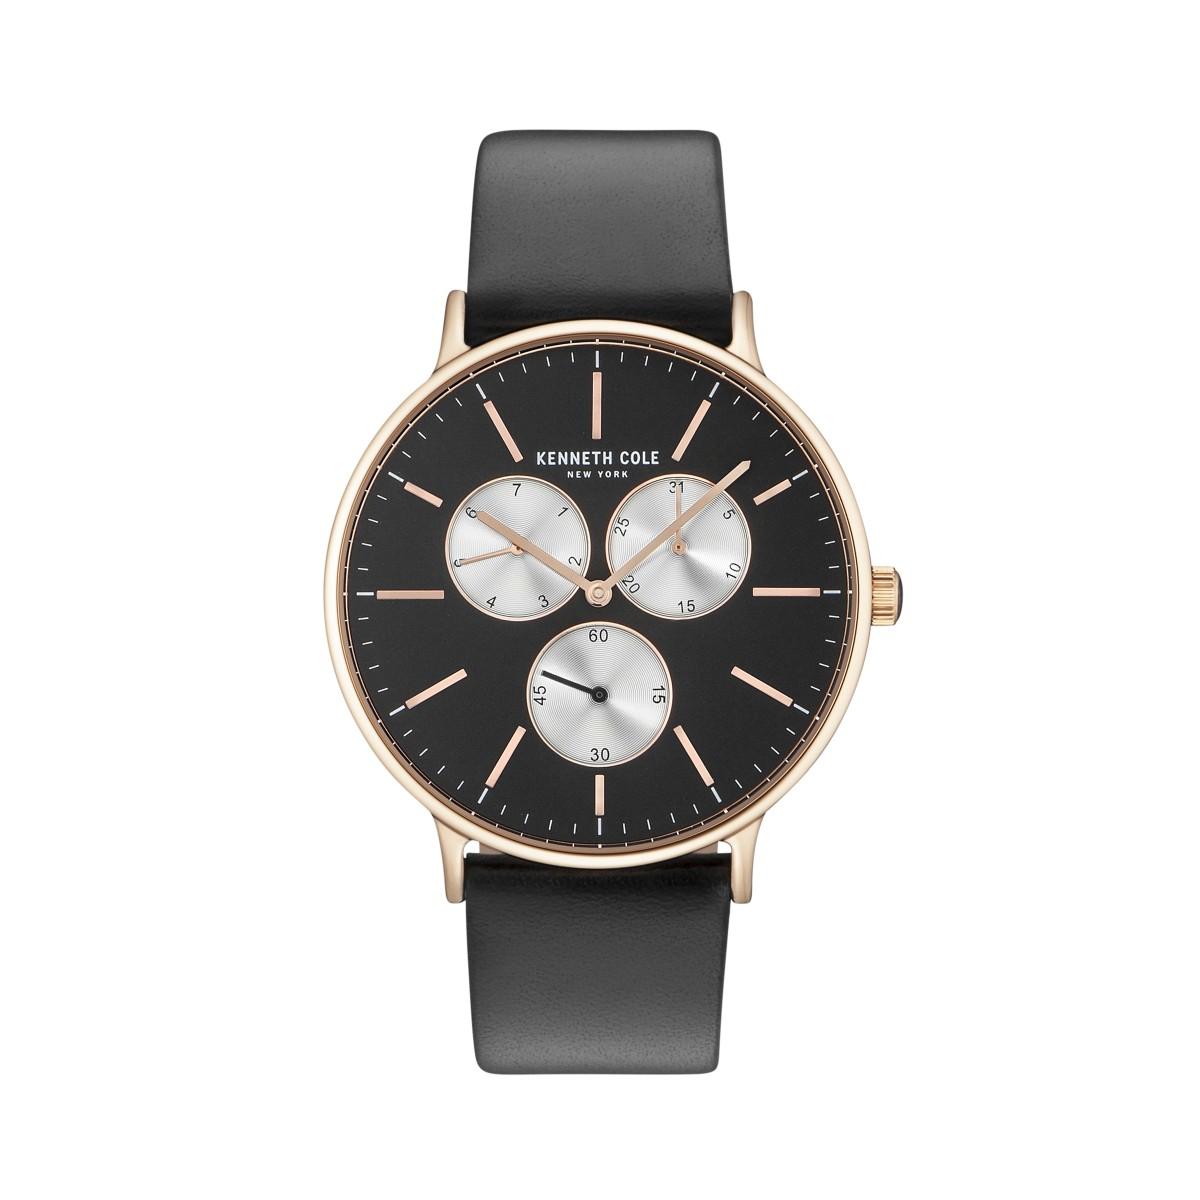 York Herren Zu New Leder Cole Kenneth Uhr Armbanduhr Details Kc14946006 OPw80XNnkZ